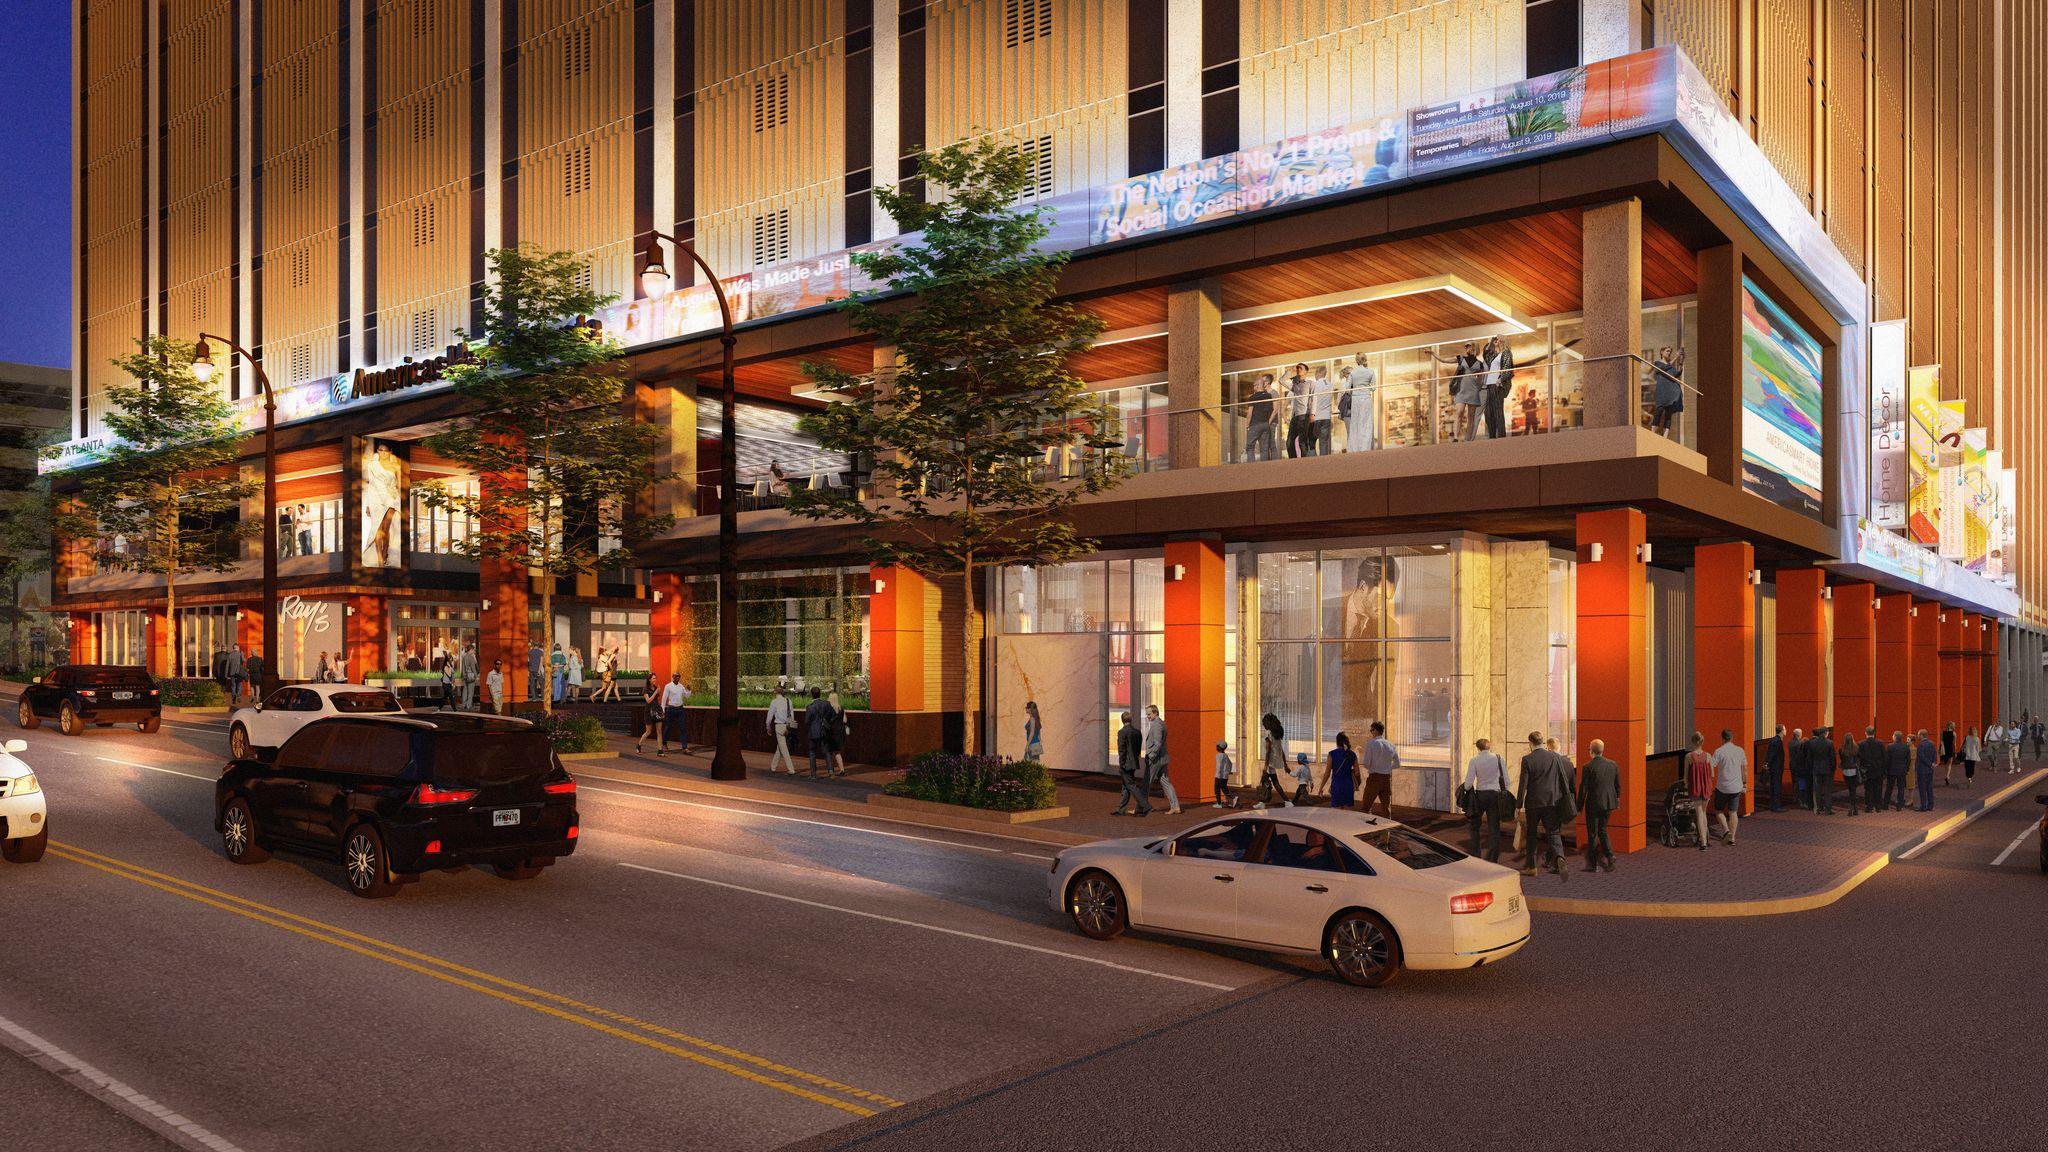 A rendering shows new digital signage, including a banner ticker, adorning AmericasMart.